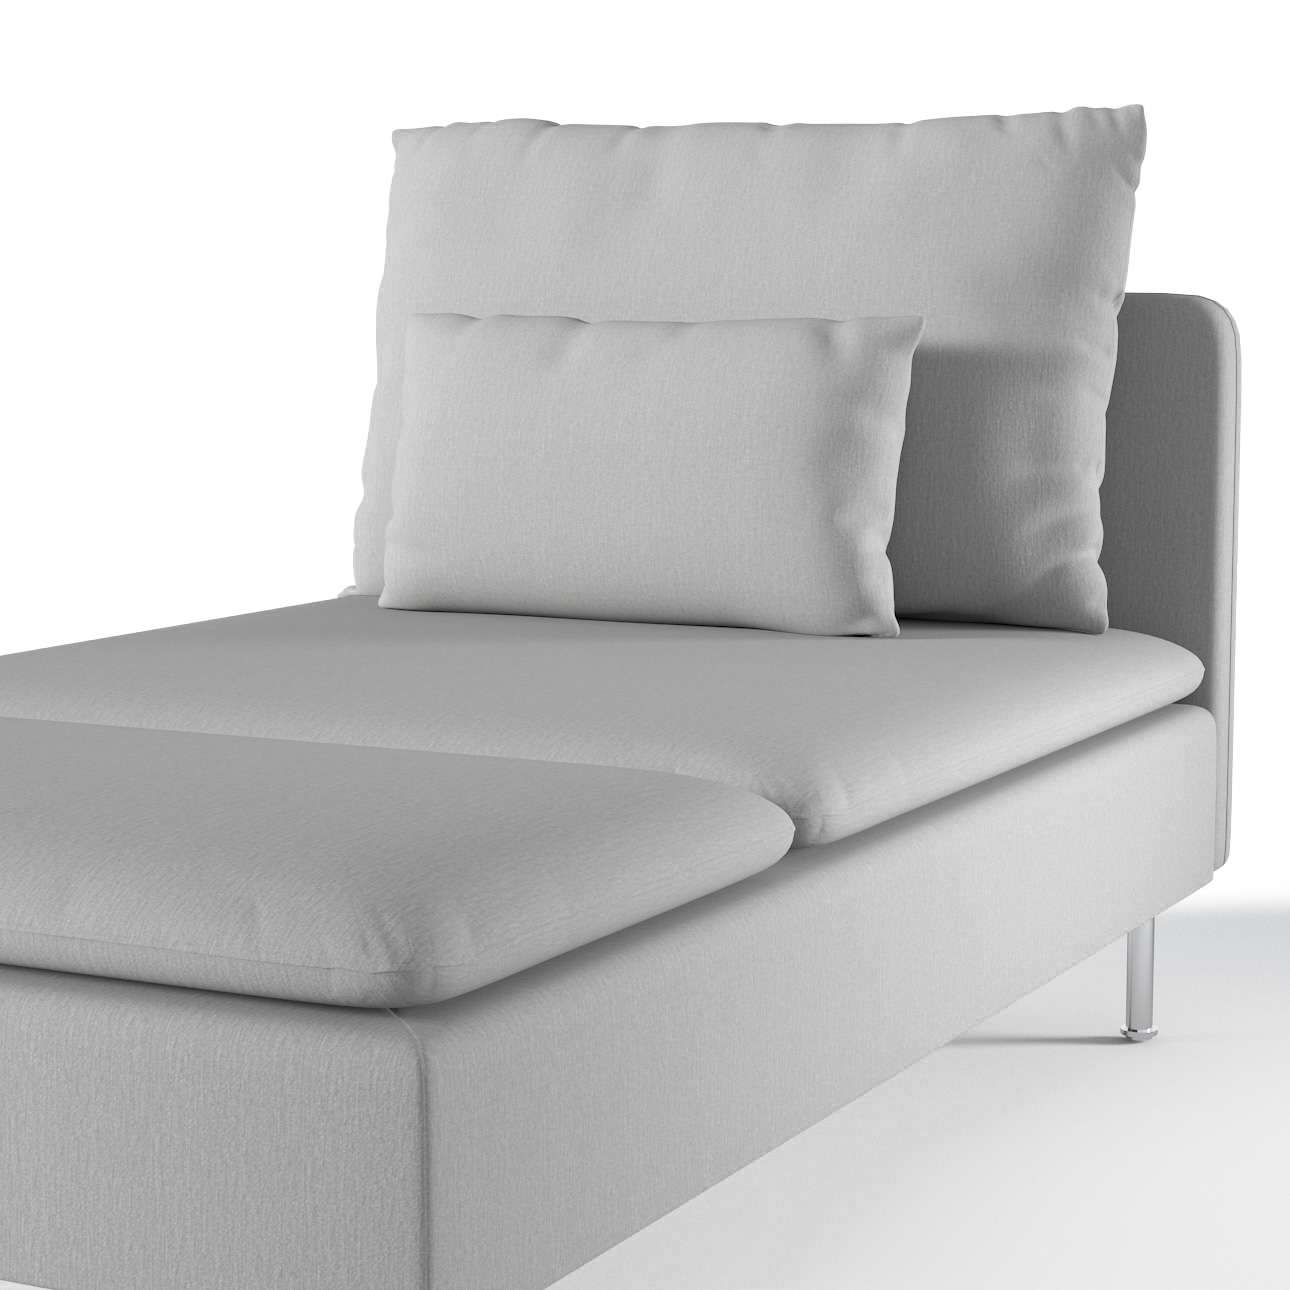 s derhamn bezug f r recamiere hellgrau recamiere s derhamn dekoria. Black Bedroom Furniture Sets. Home Design Ideas